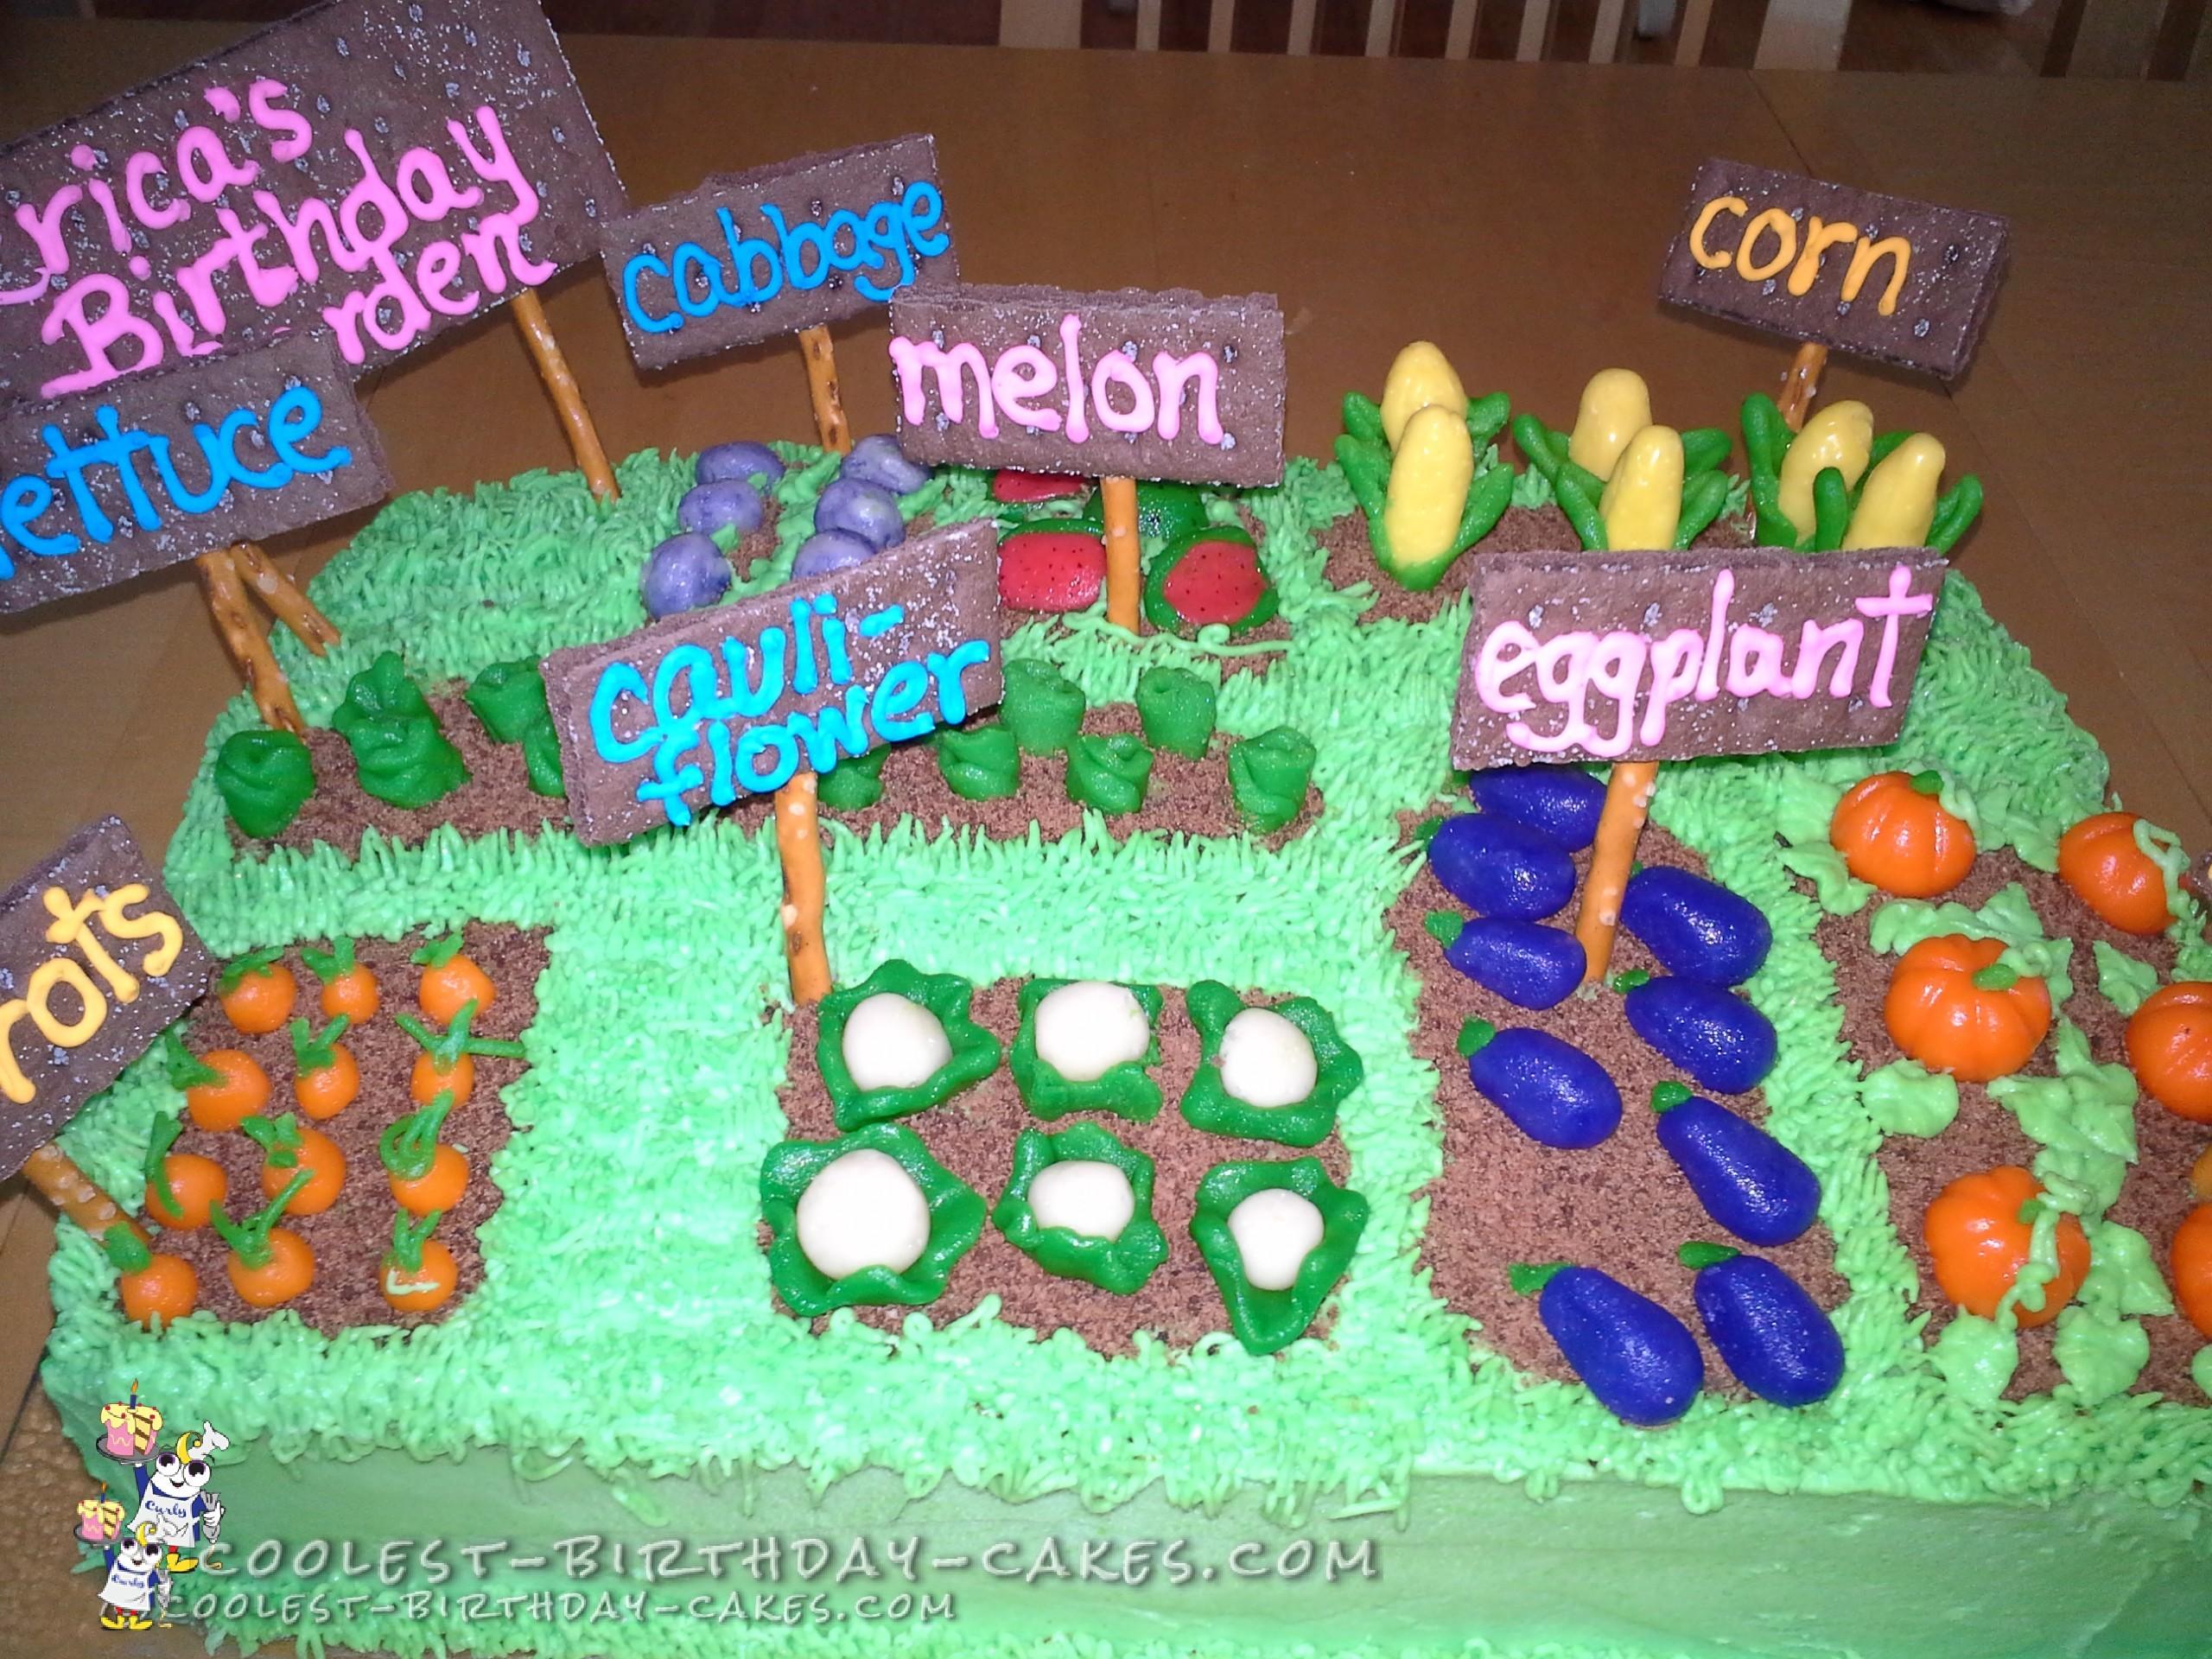 Coolest Birthday Cake Recipe Ideas